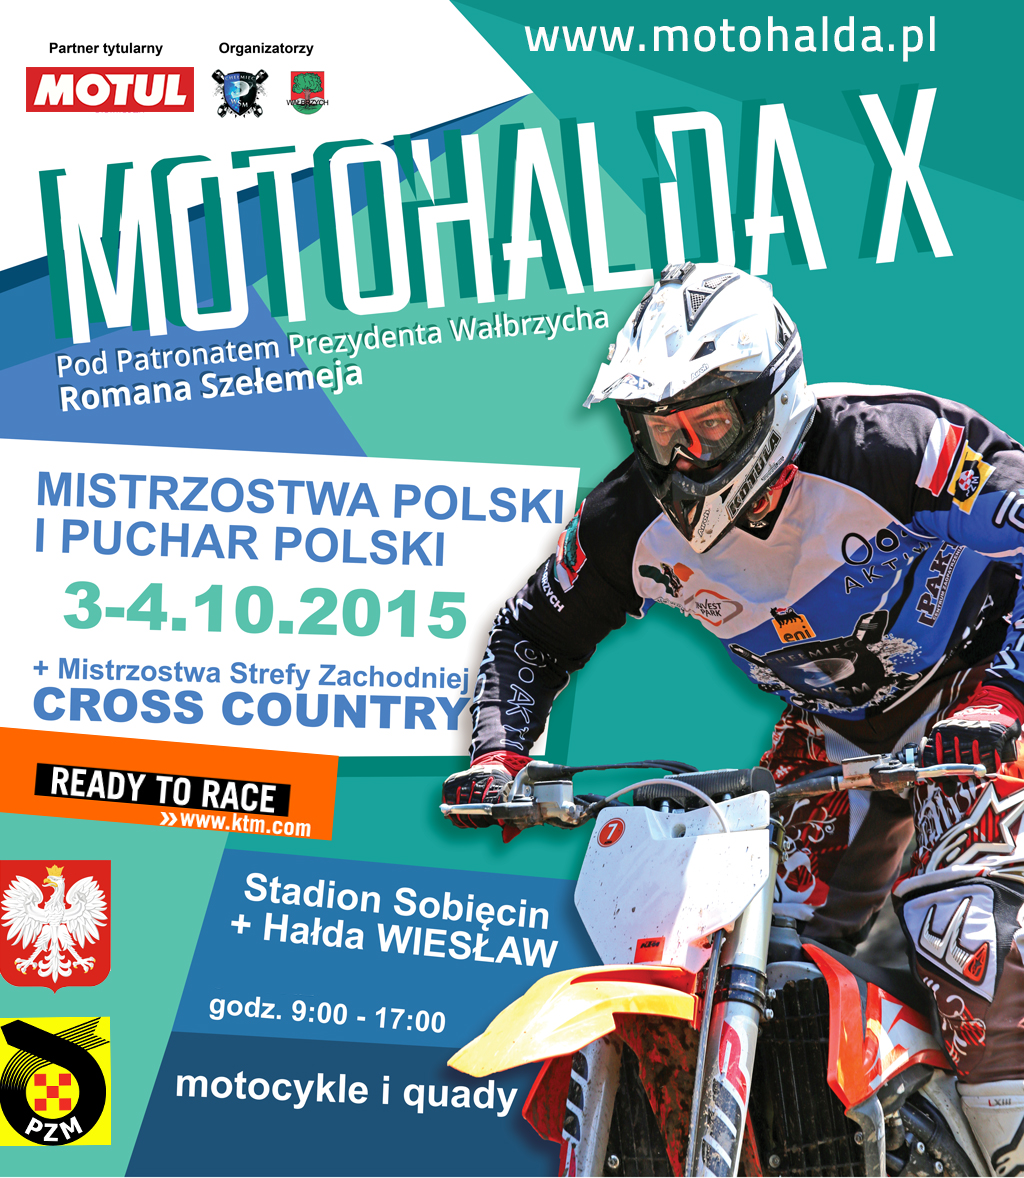 Motohałda 2015 Cross Country